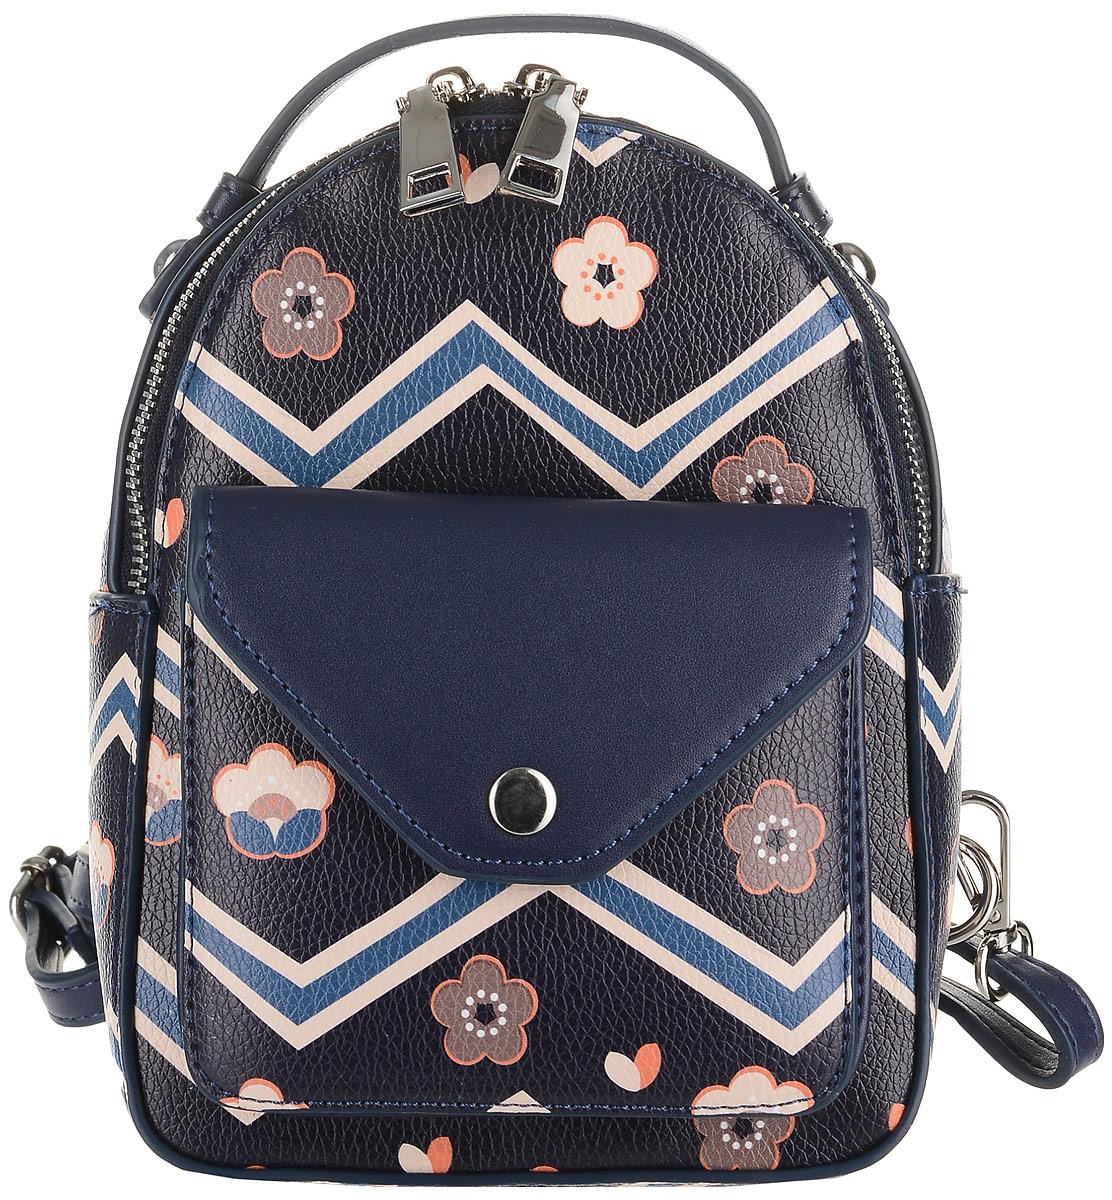 цена Рюкзак женский OrsOro, цвет: синий, 15 x 20 x 8 см. DS-827/1 онлайн в 2017 году